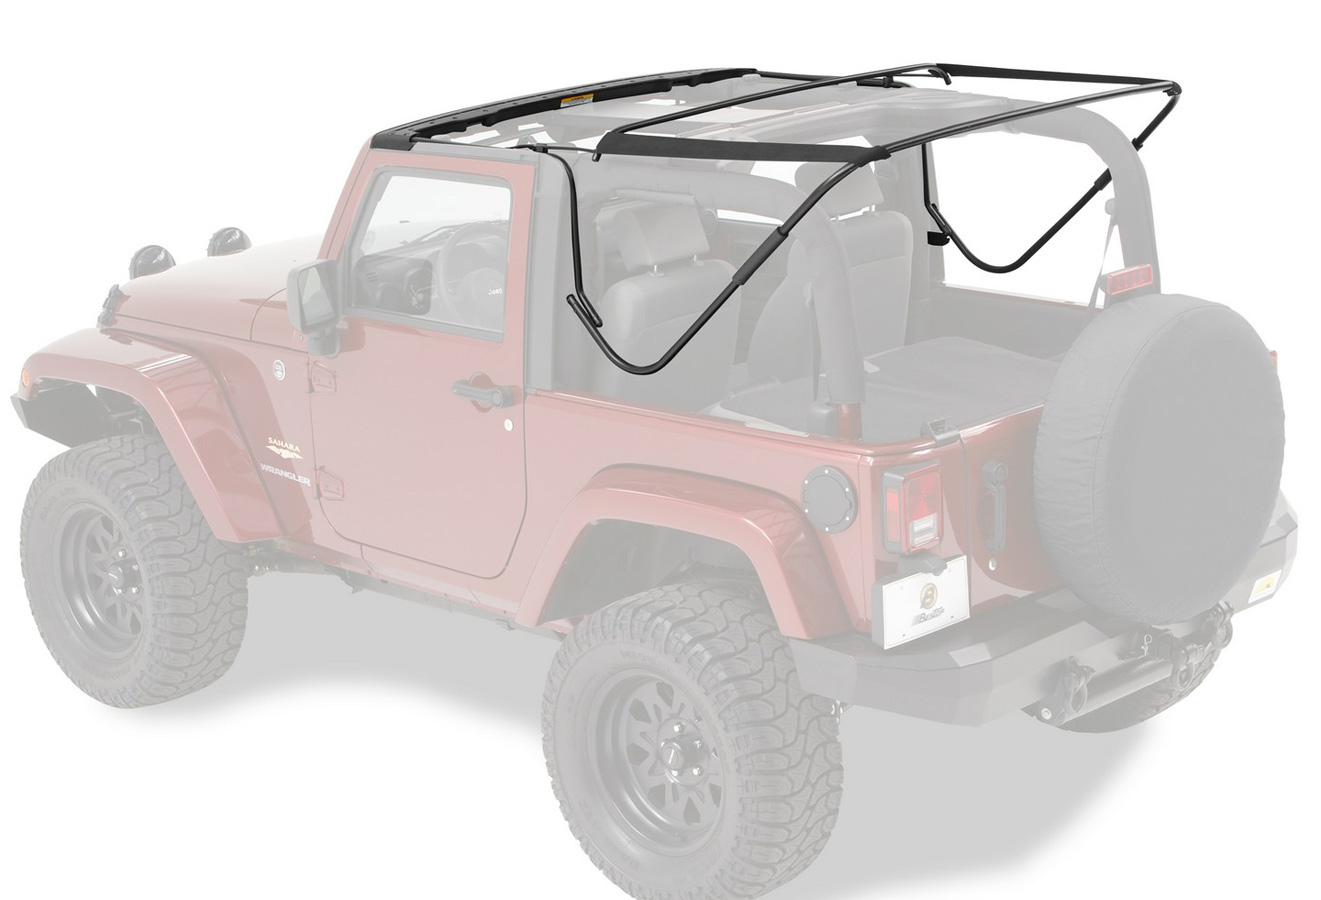 2007-2018 Jeep Wrangler Bestop Soft Top Hardware Replacement Kit ...